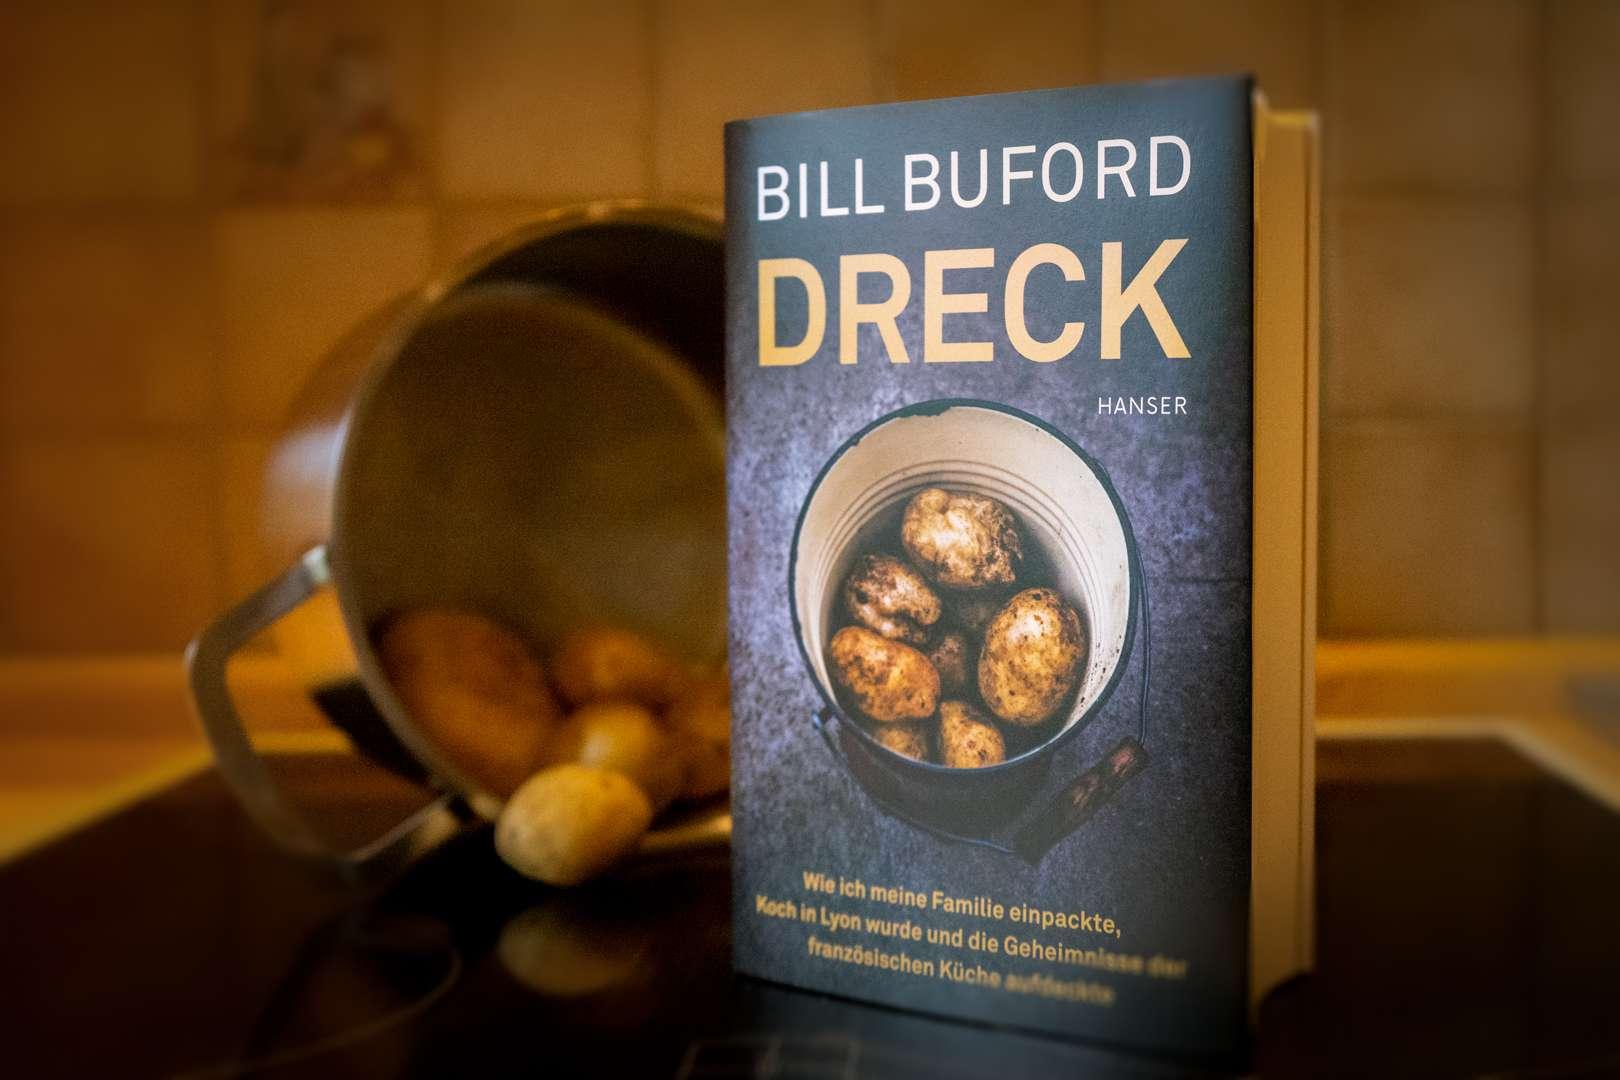 Dreck! – Bill Buford ist zurück